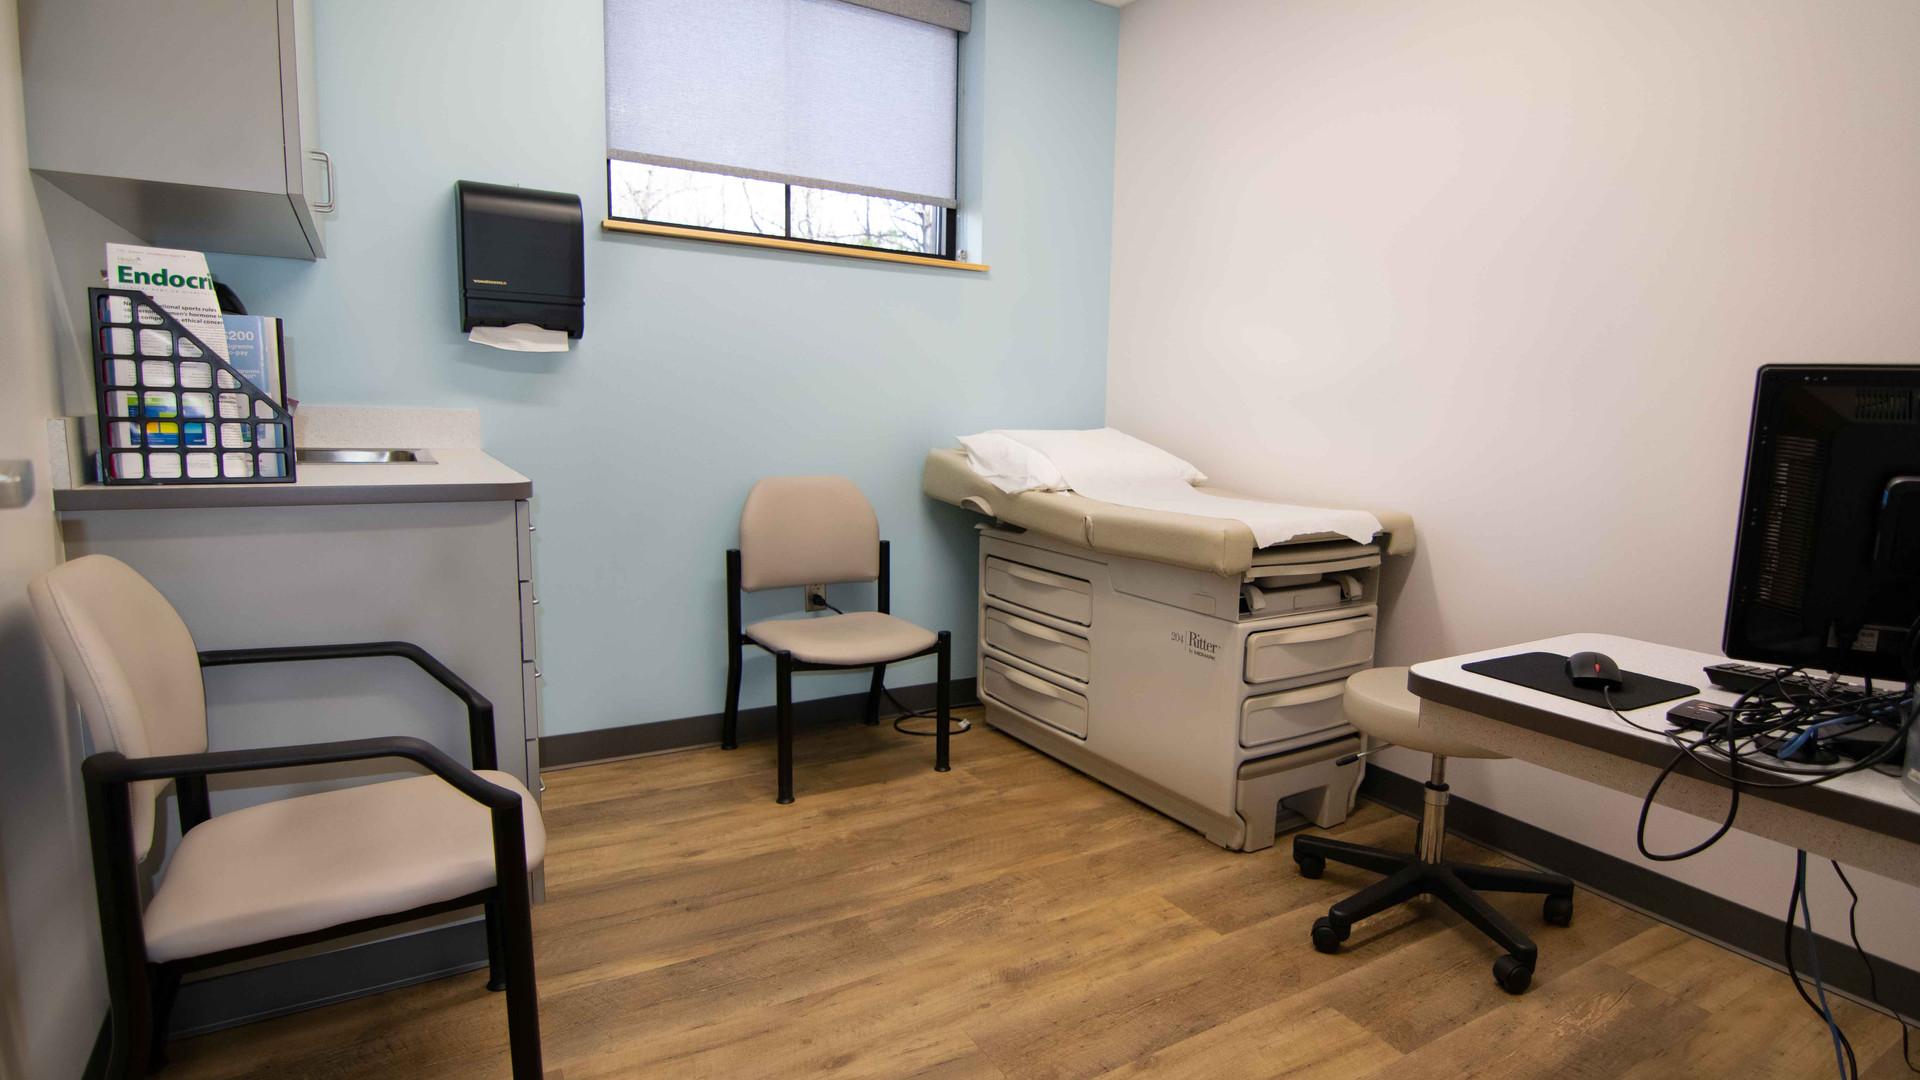 Piedmont Healthcare - Endocrinology